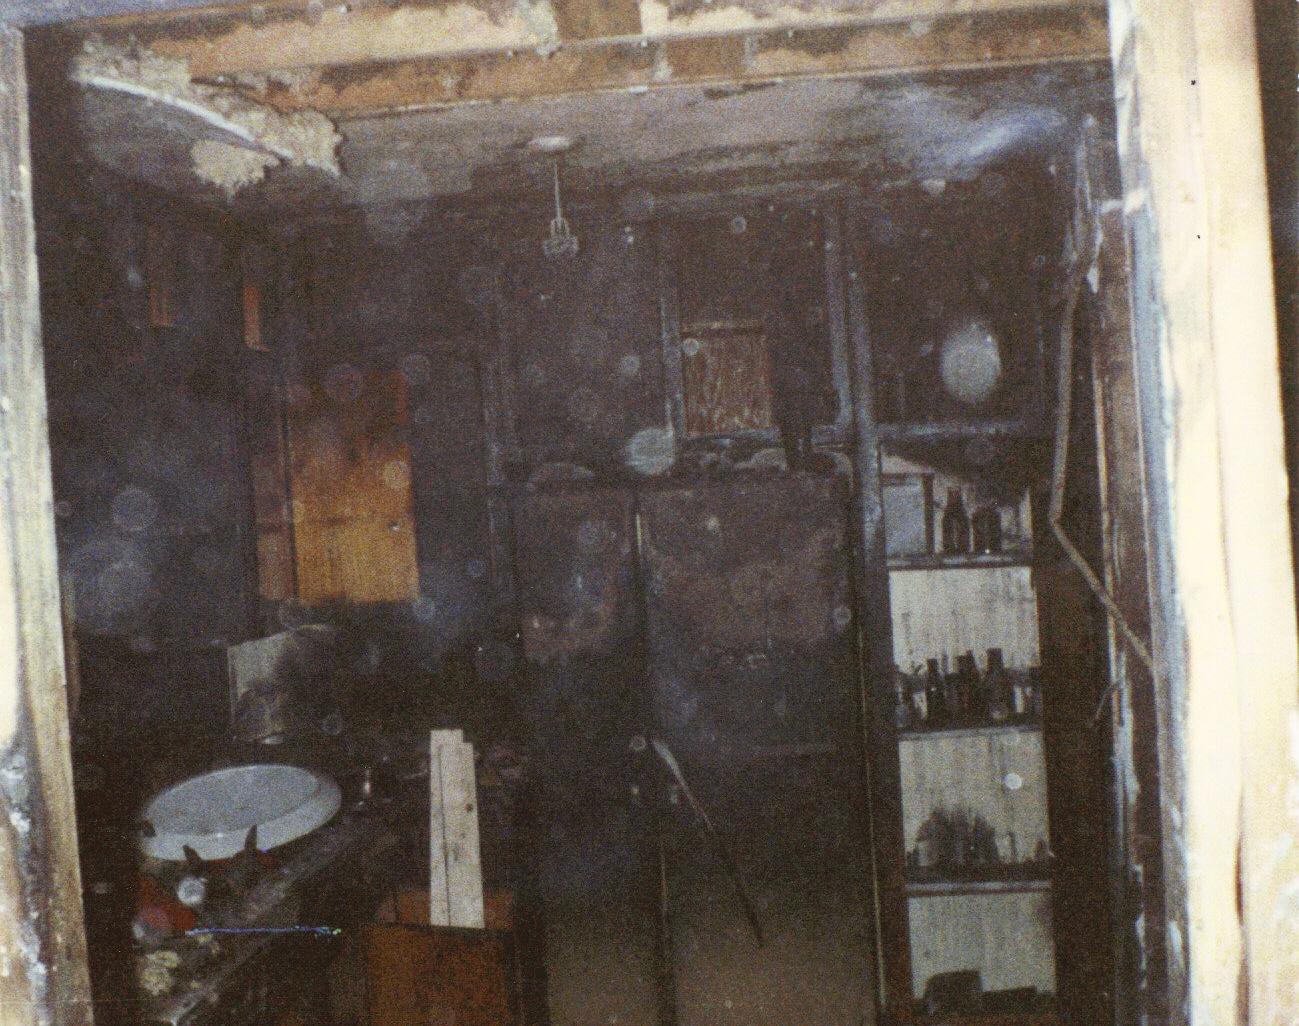 Door Repair Window Repair In Roswell Sandy Springs Douglasville Carrollton Marietta